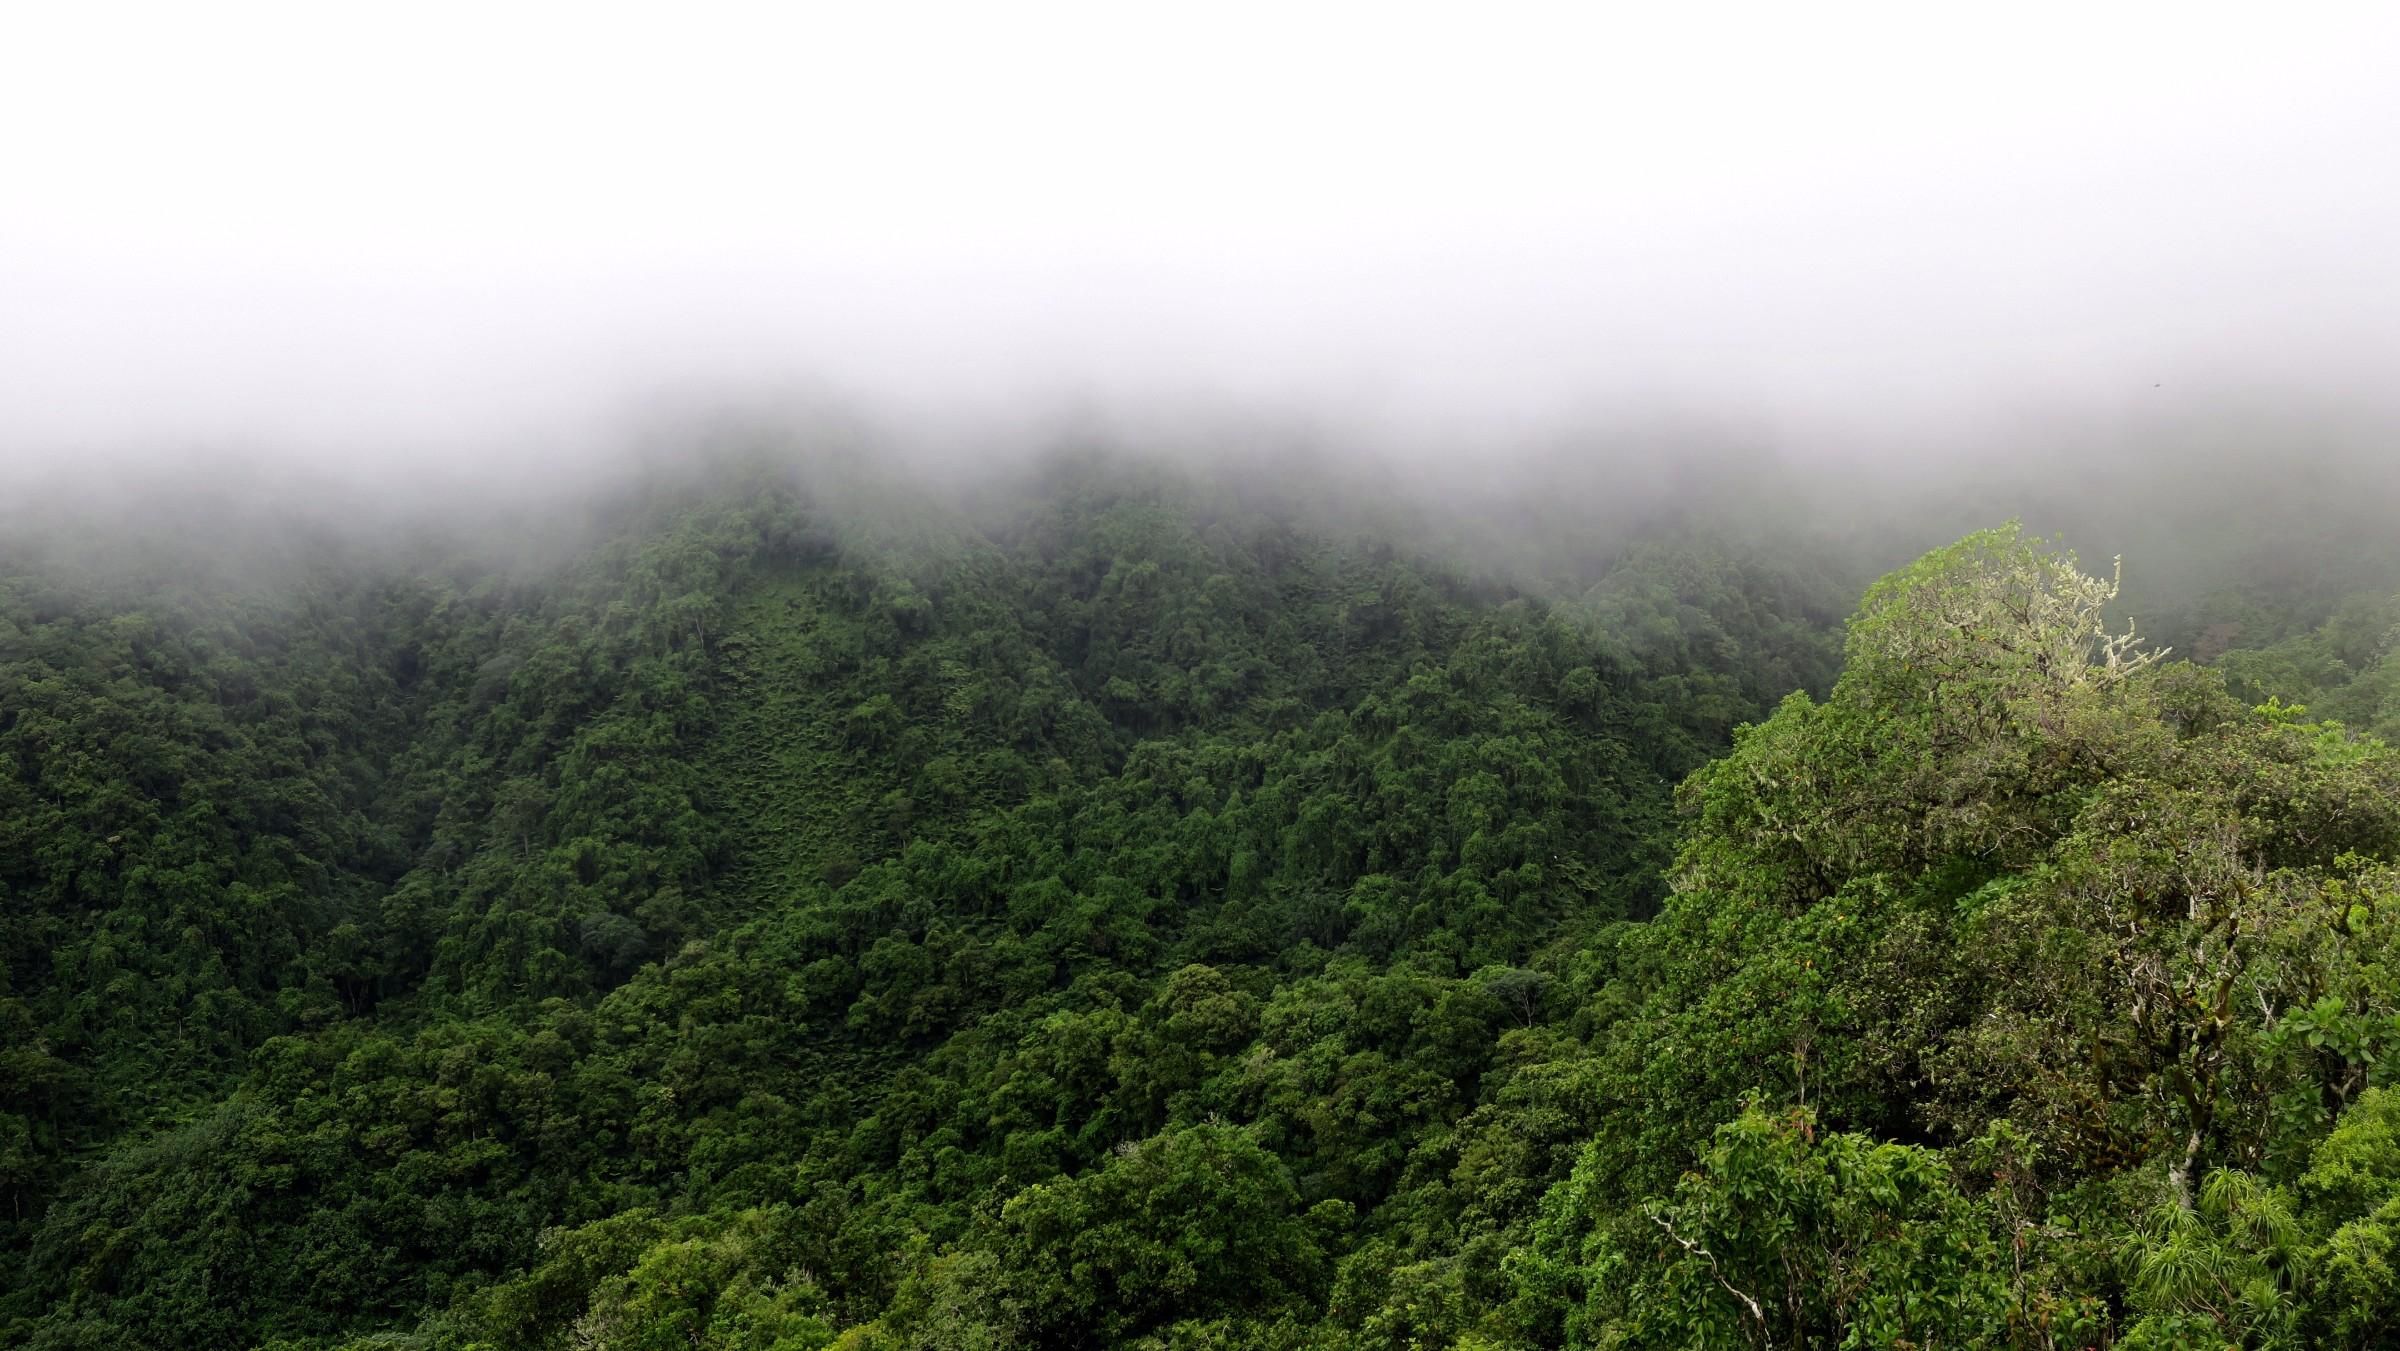 cross island trek view of inner island jungle